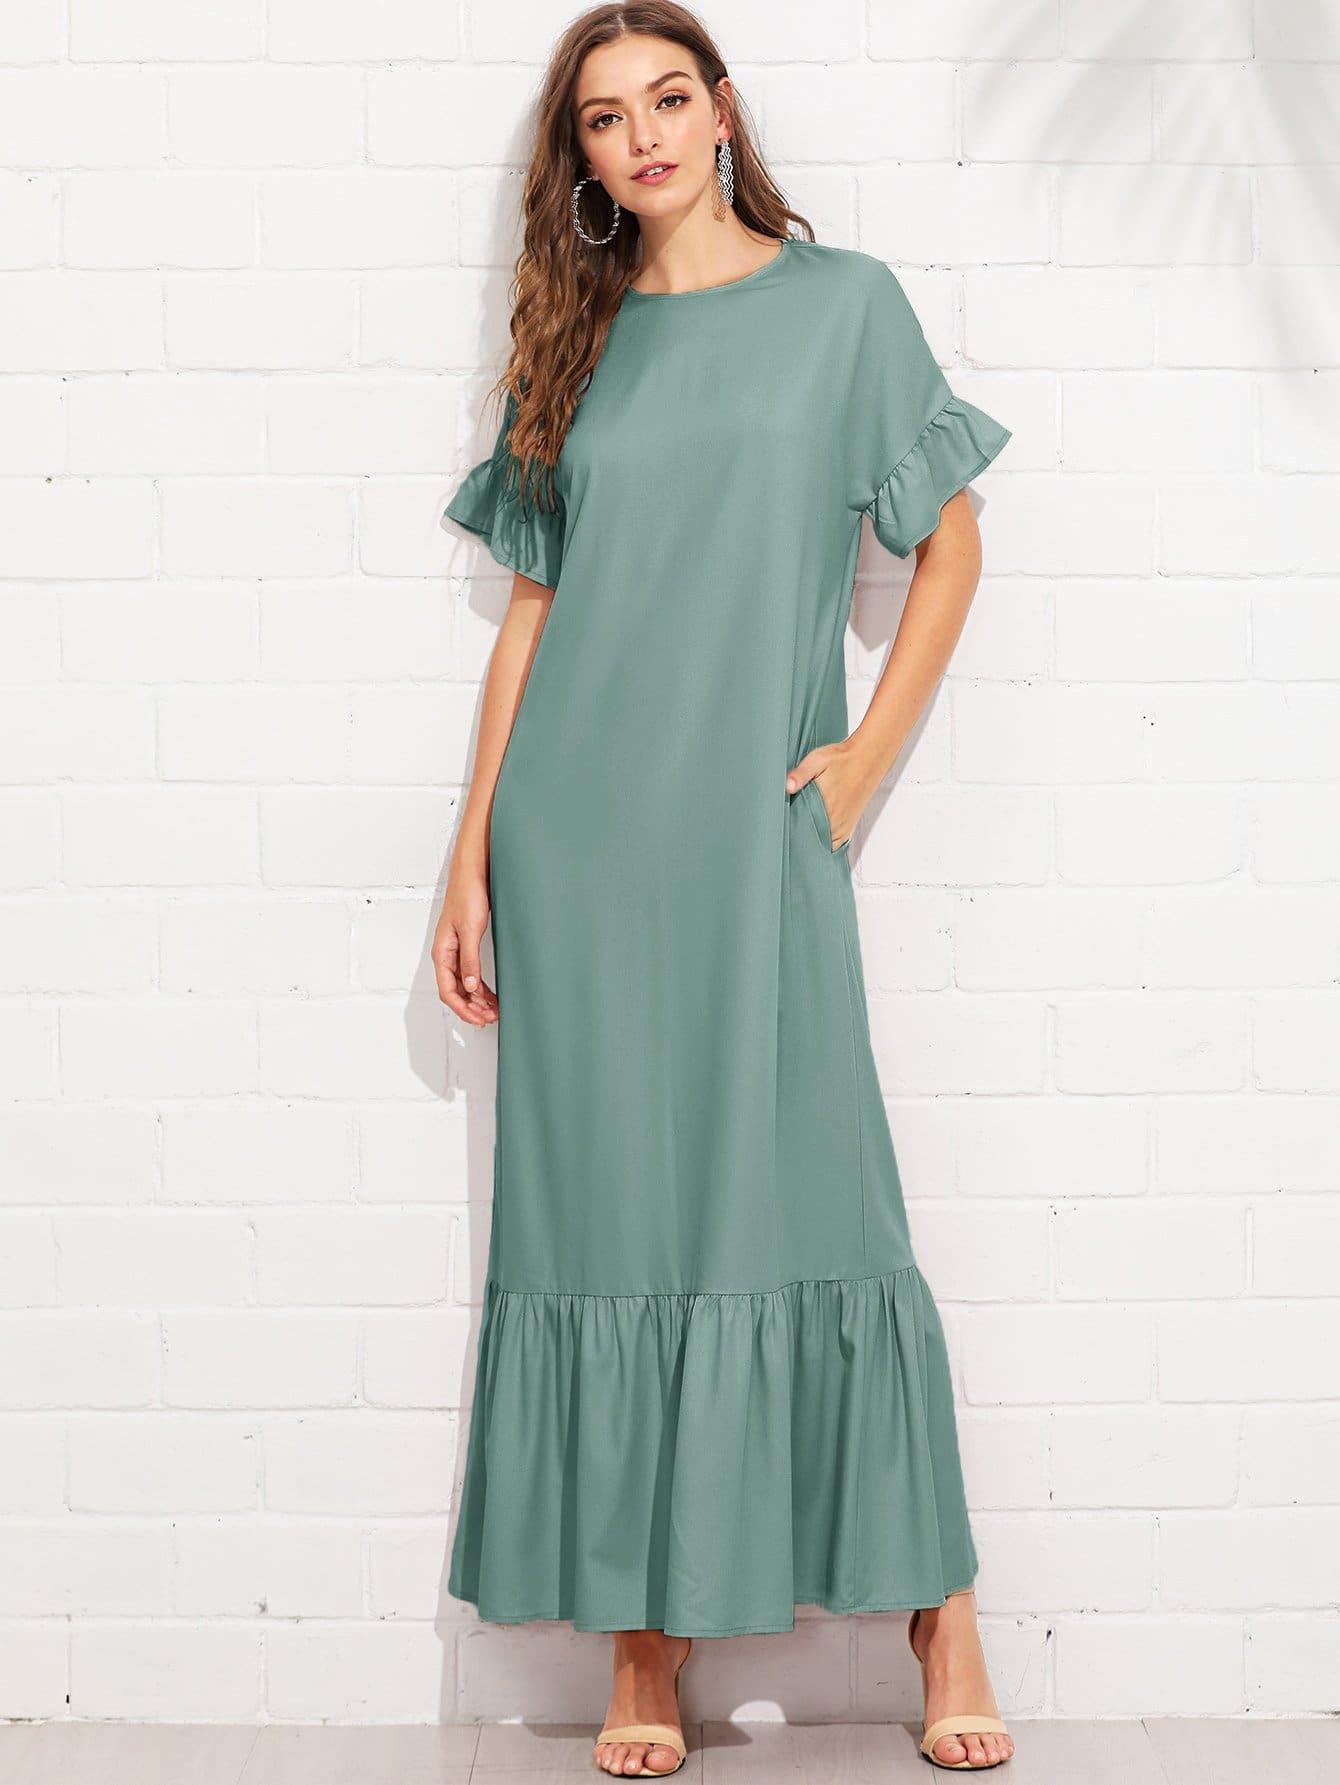 Ruffle Sleeve Tiered Hem Full Length Dress